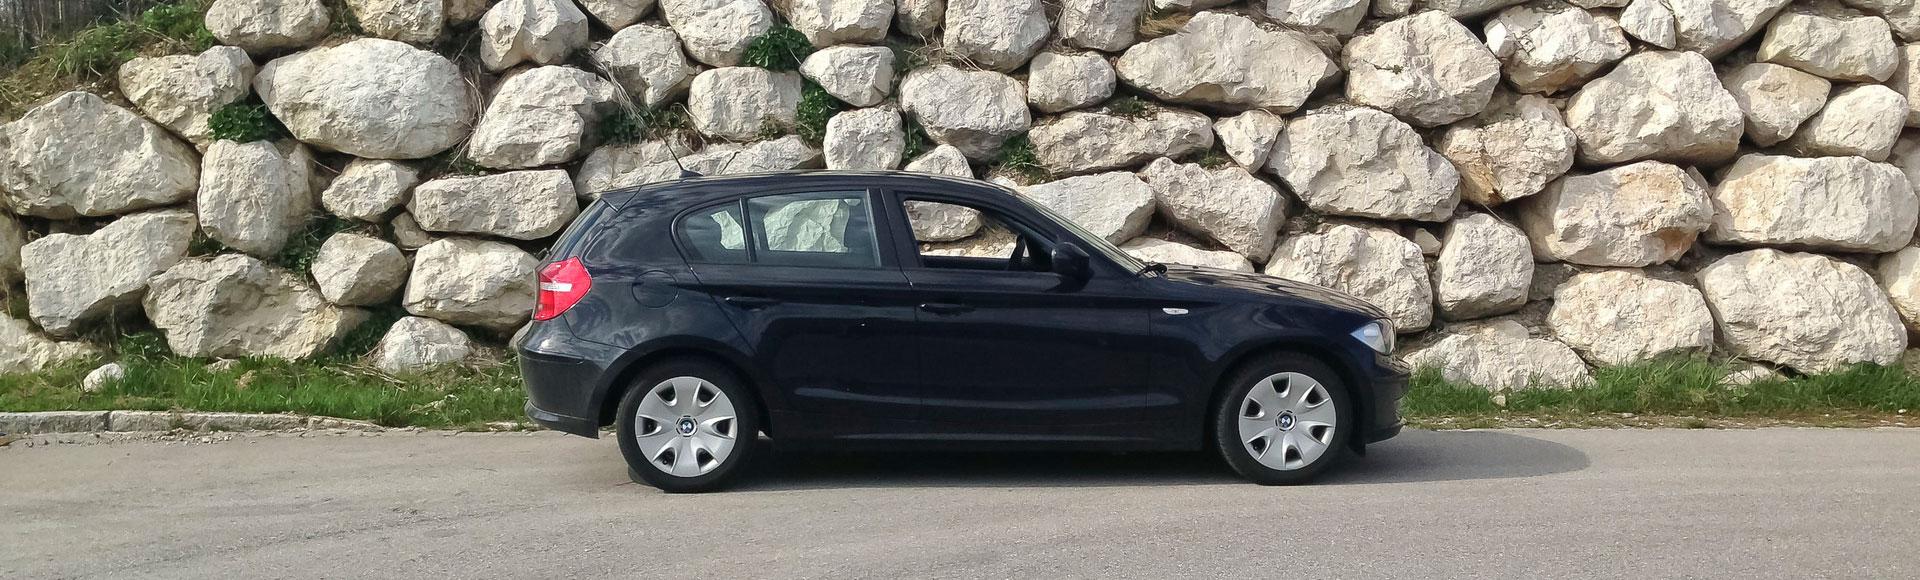 BMW 1er Diesel 2013 1